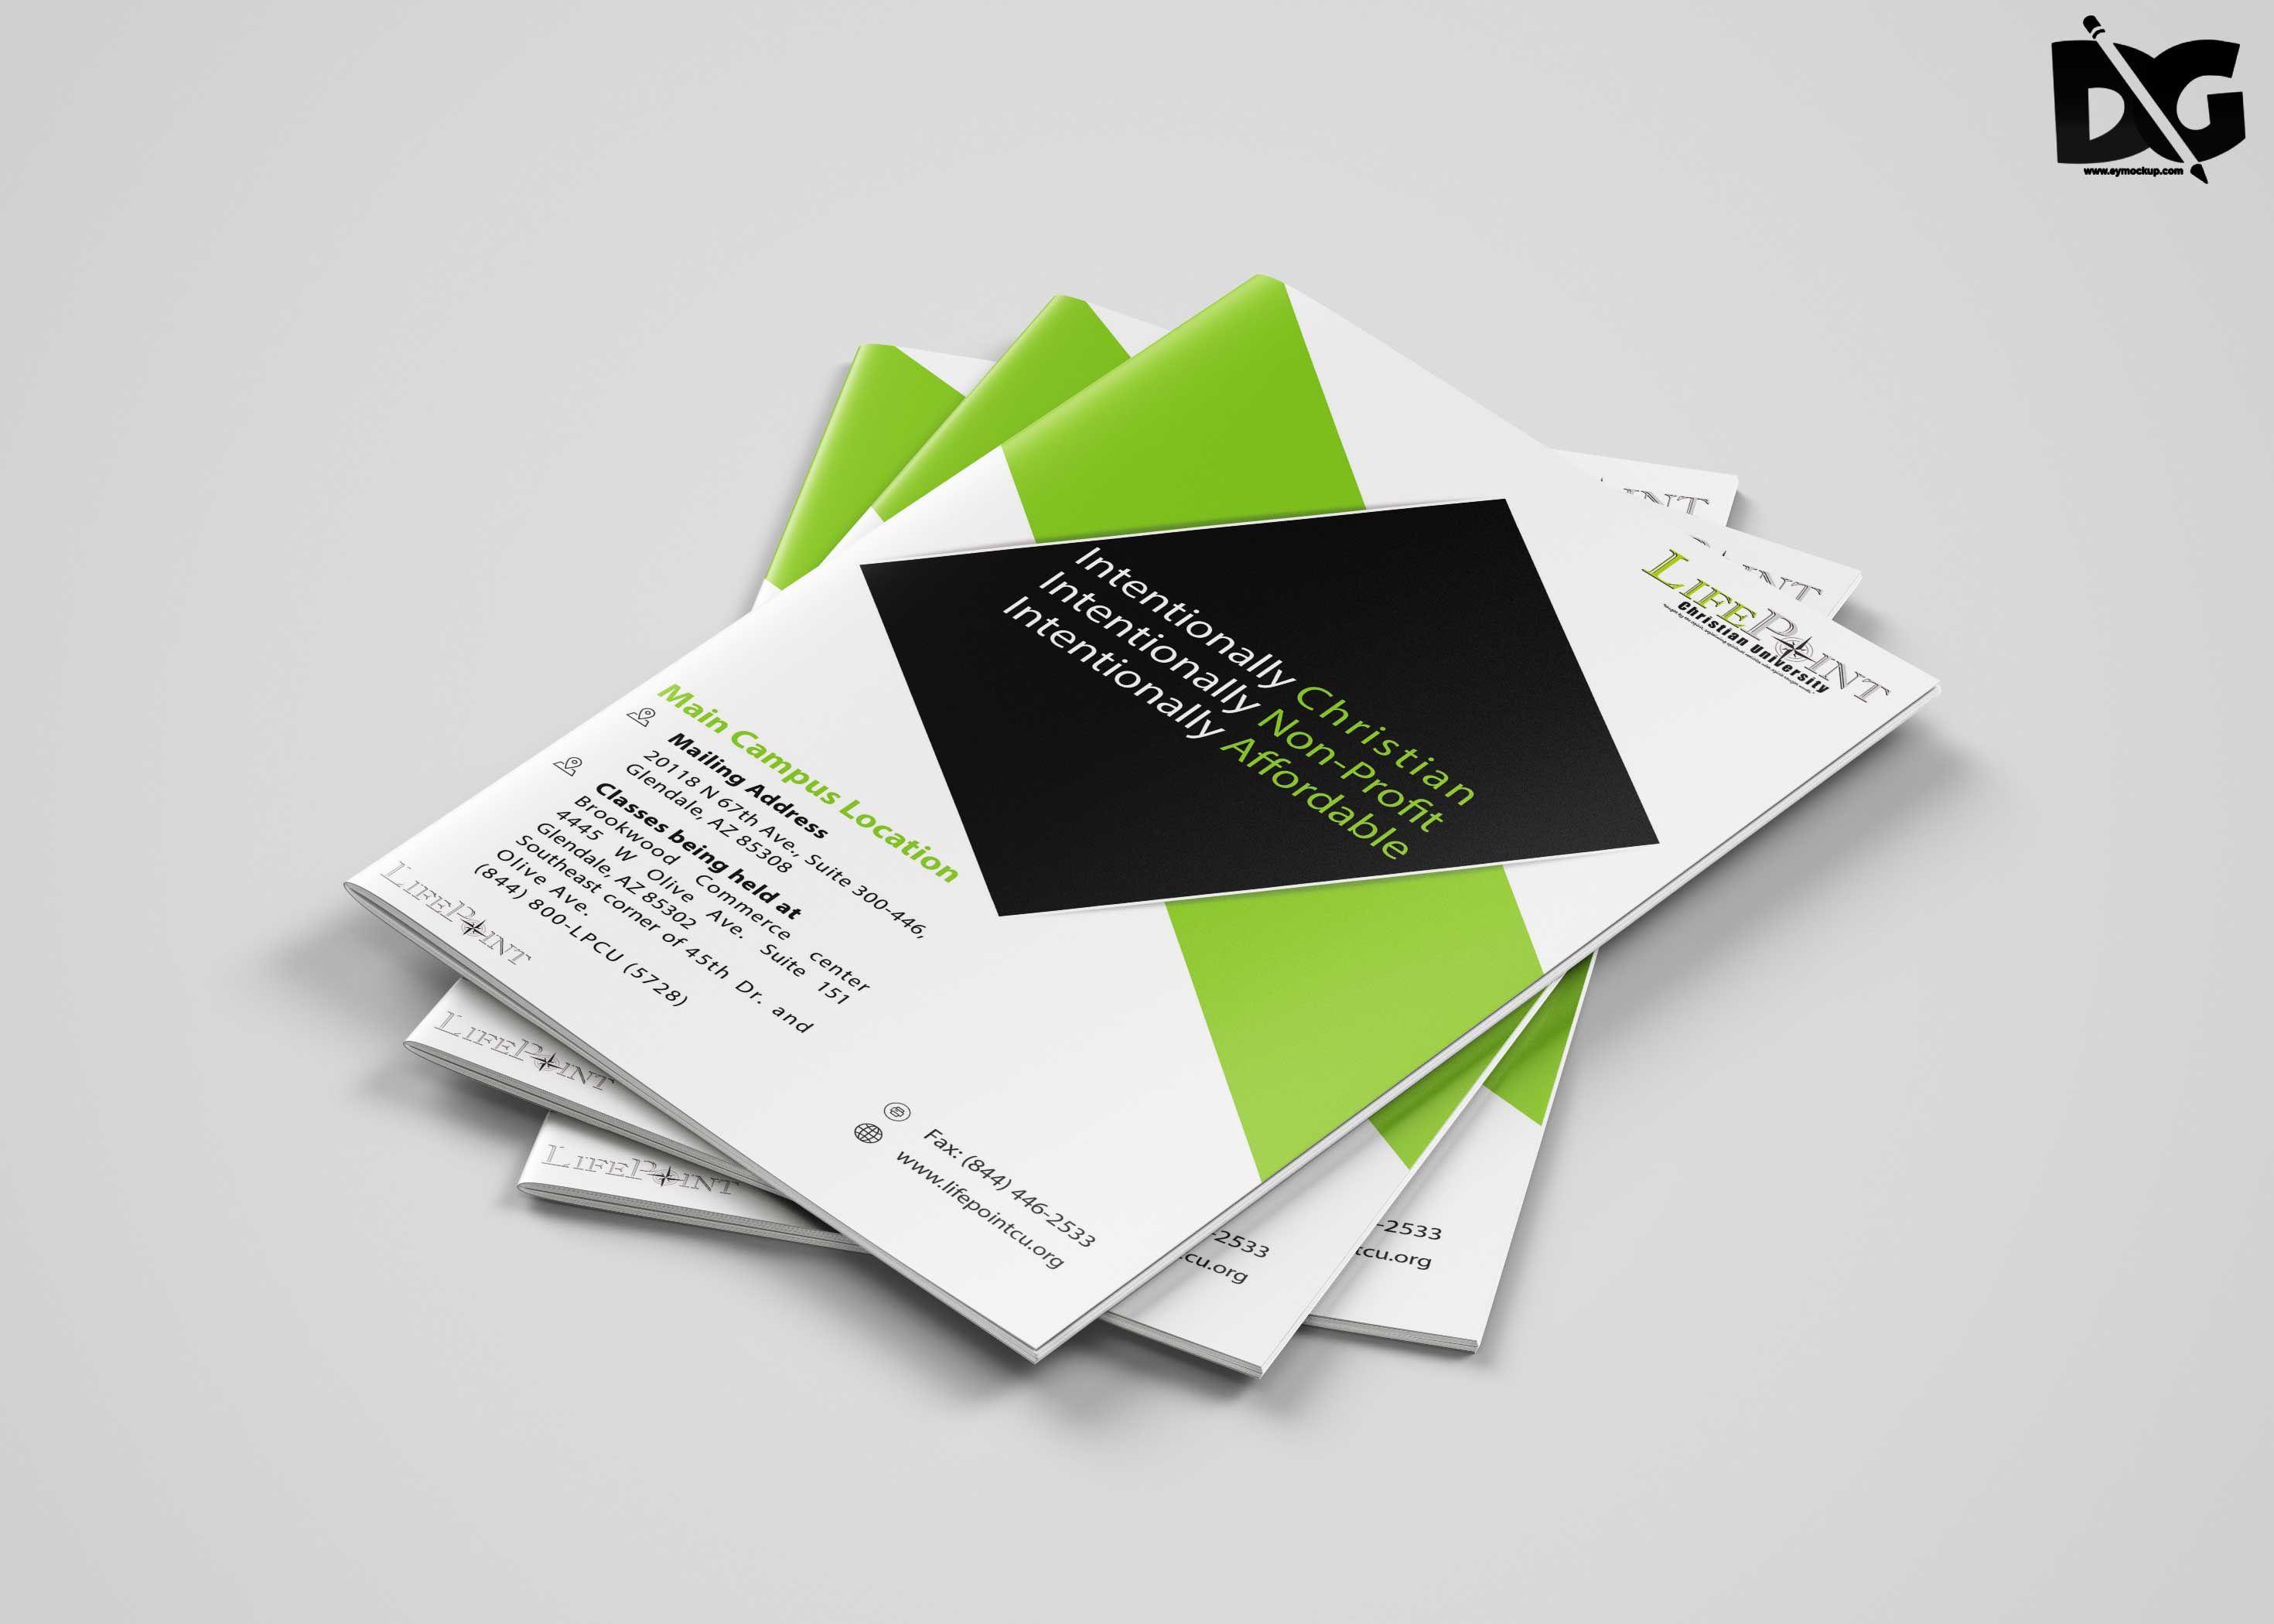 005 Unbelievable Photoshop Brochure Design Template Free Download Photo